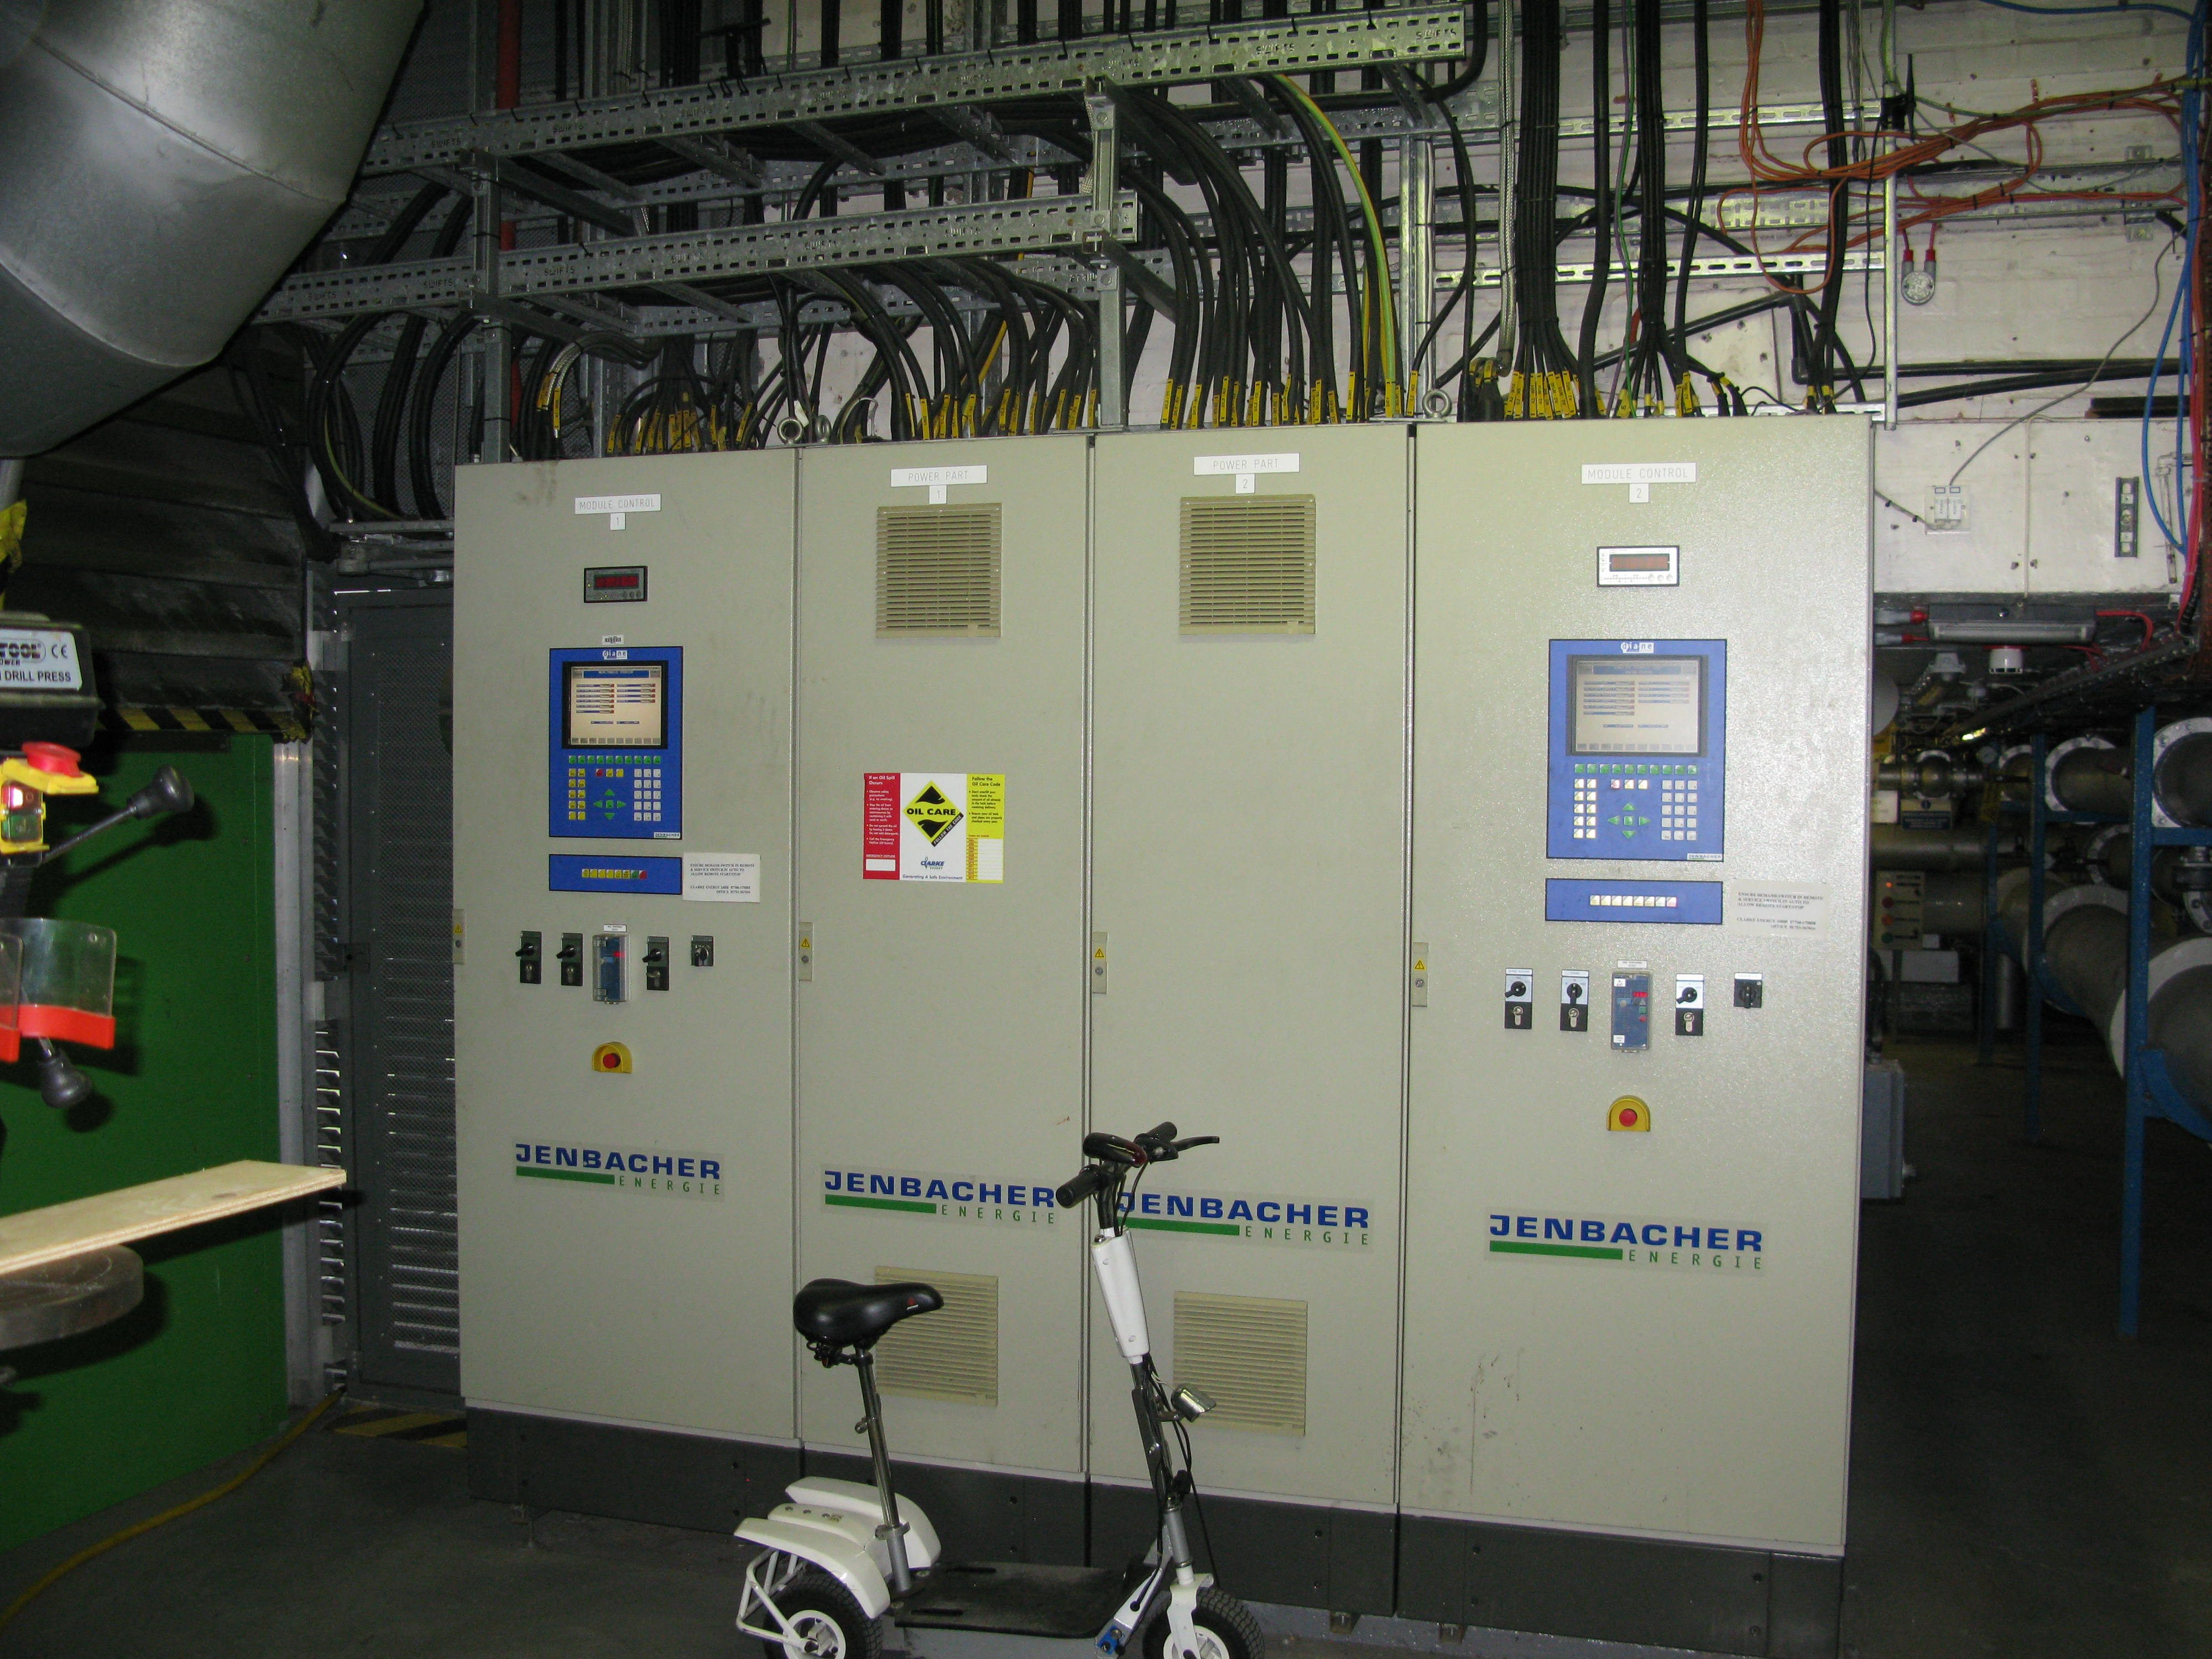 CHP control panels